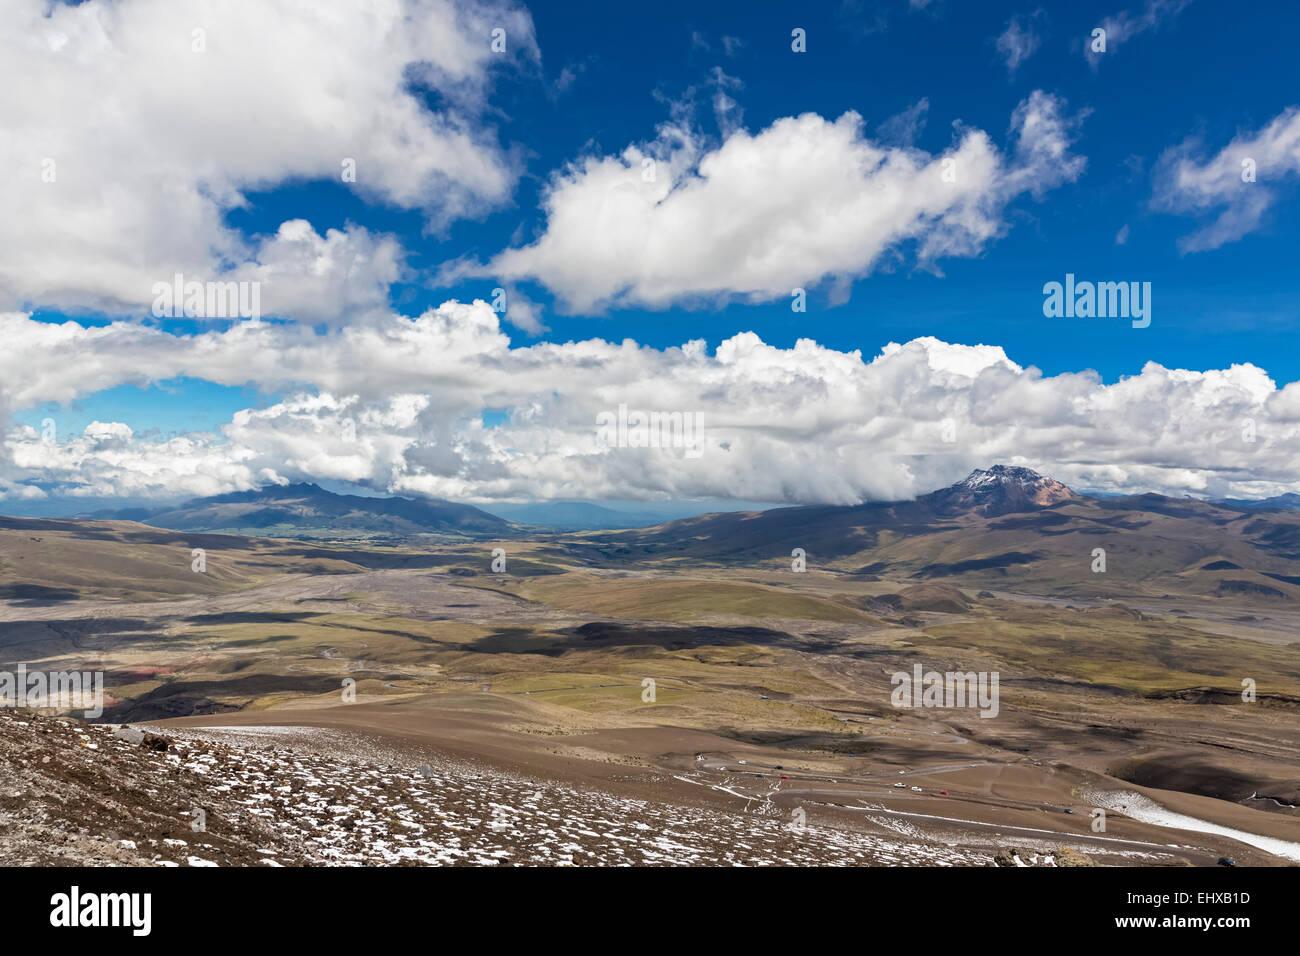 Südamerika, Ecuador, Provinz Vulkan Cotopaxi, anzeigen Sincholagua Vulkan Cotopaxi Nationalpark Stockbild